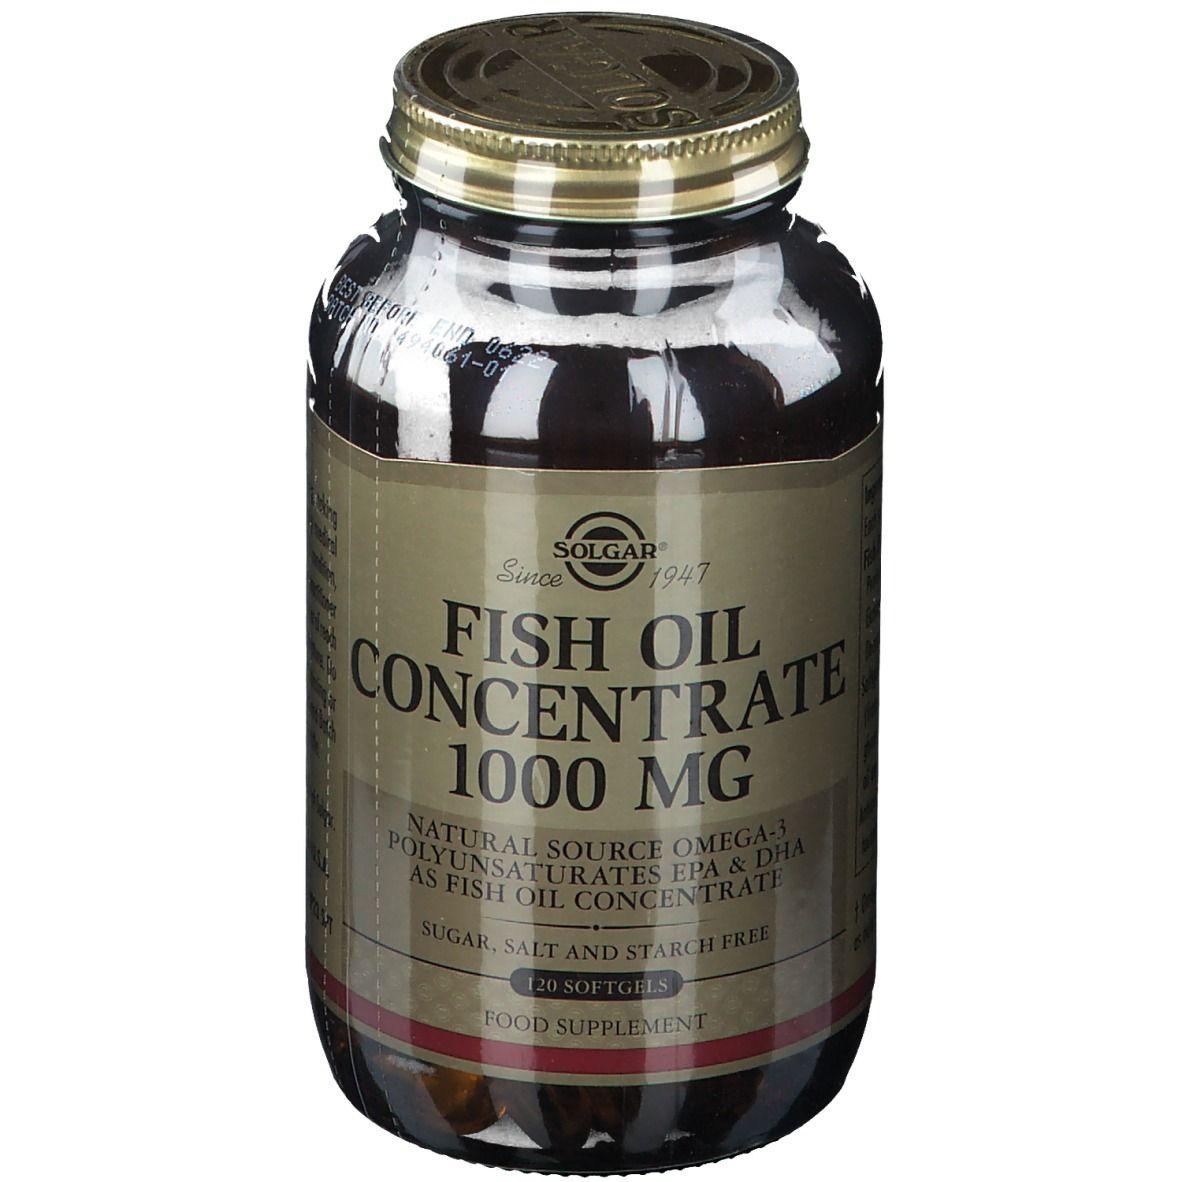 Solgar Fish Oil Concentrate 1000 mg - shop-apotheke.ch